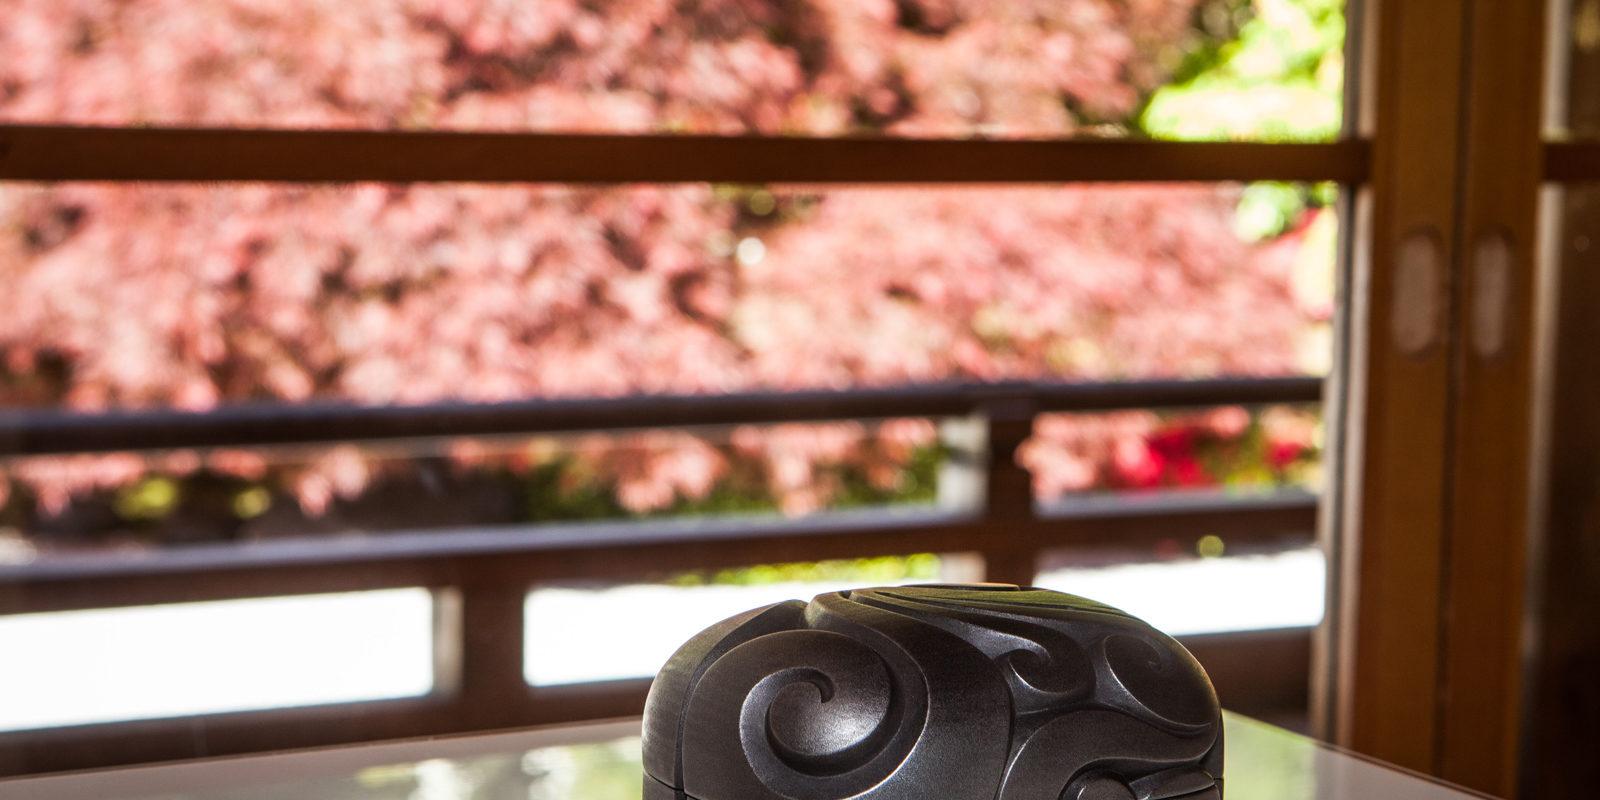 69_Hakkodo - 2015-04-29 - 16373_b904dae378a0efc